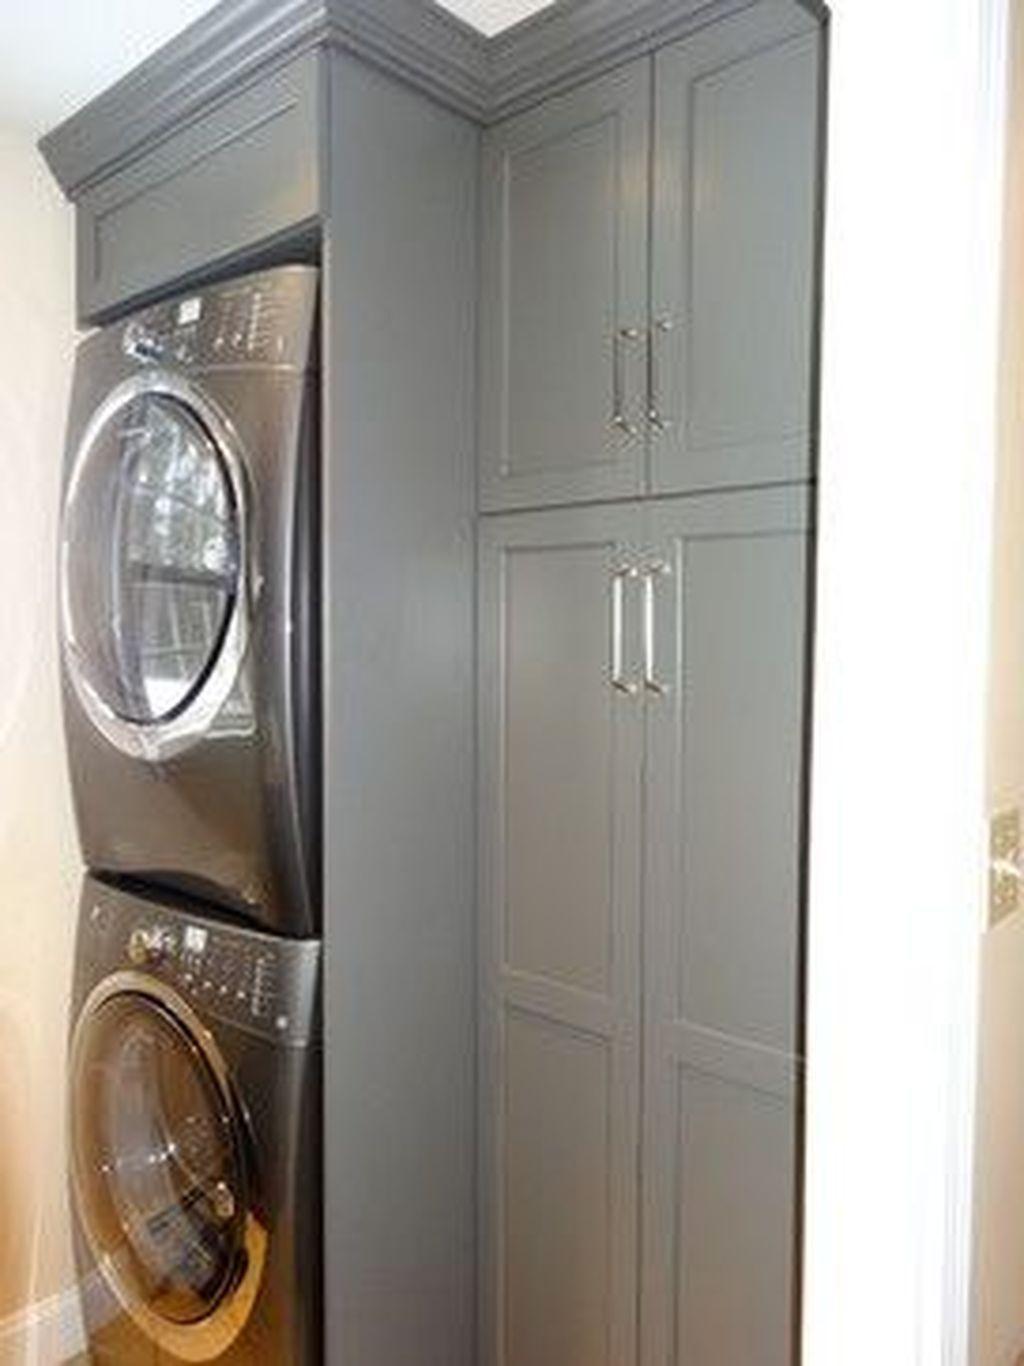 48 Wonderful Laundry Room Makeover Design Ideas images